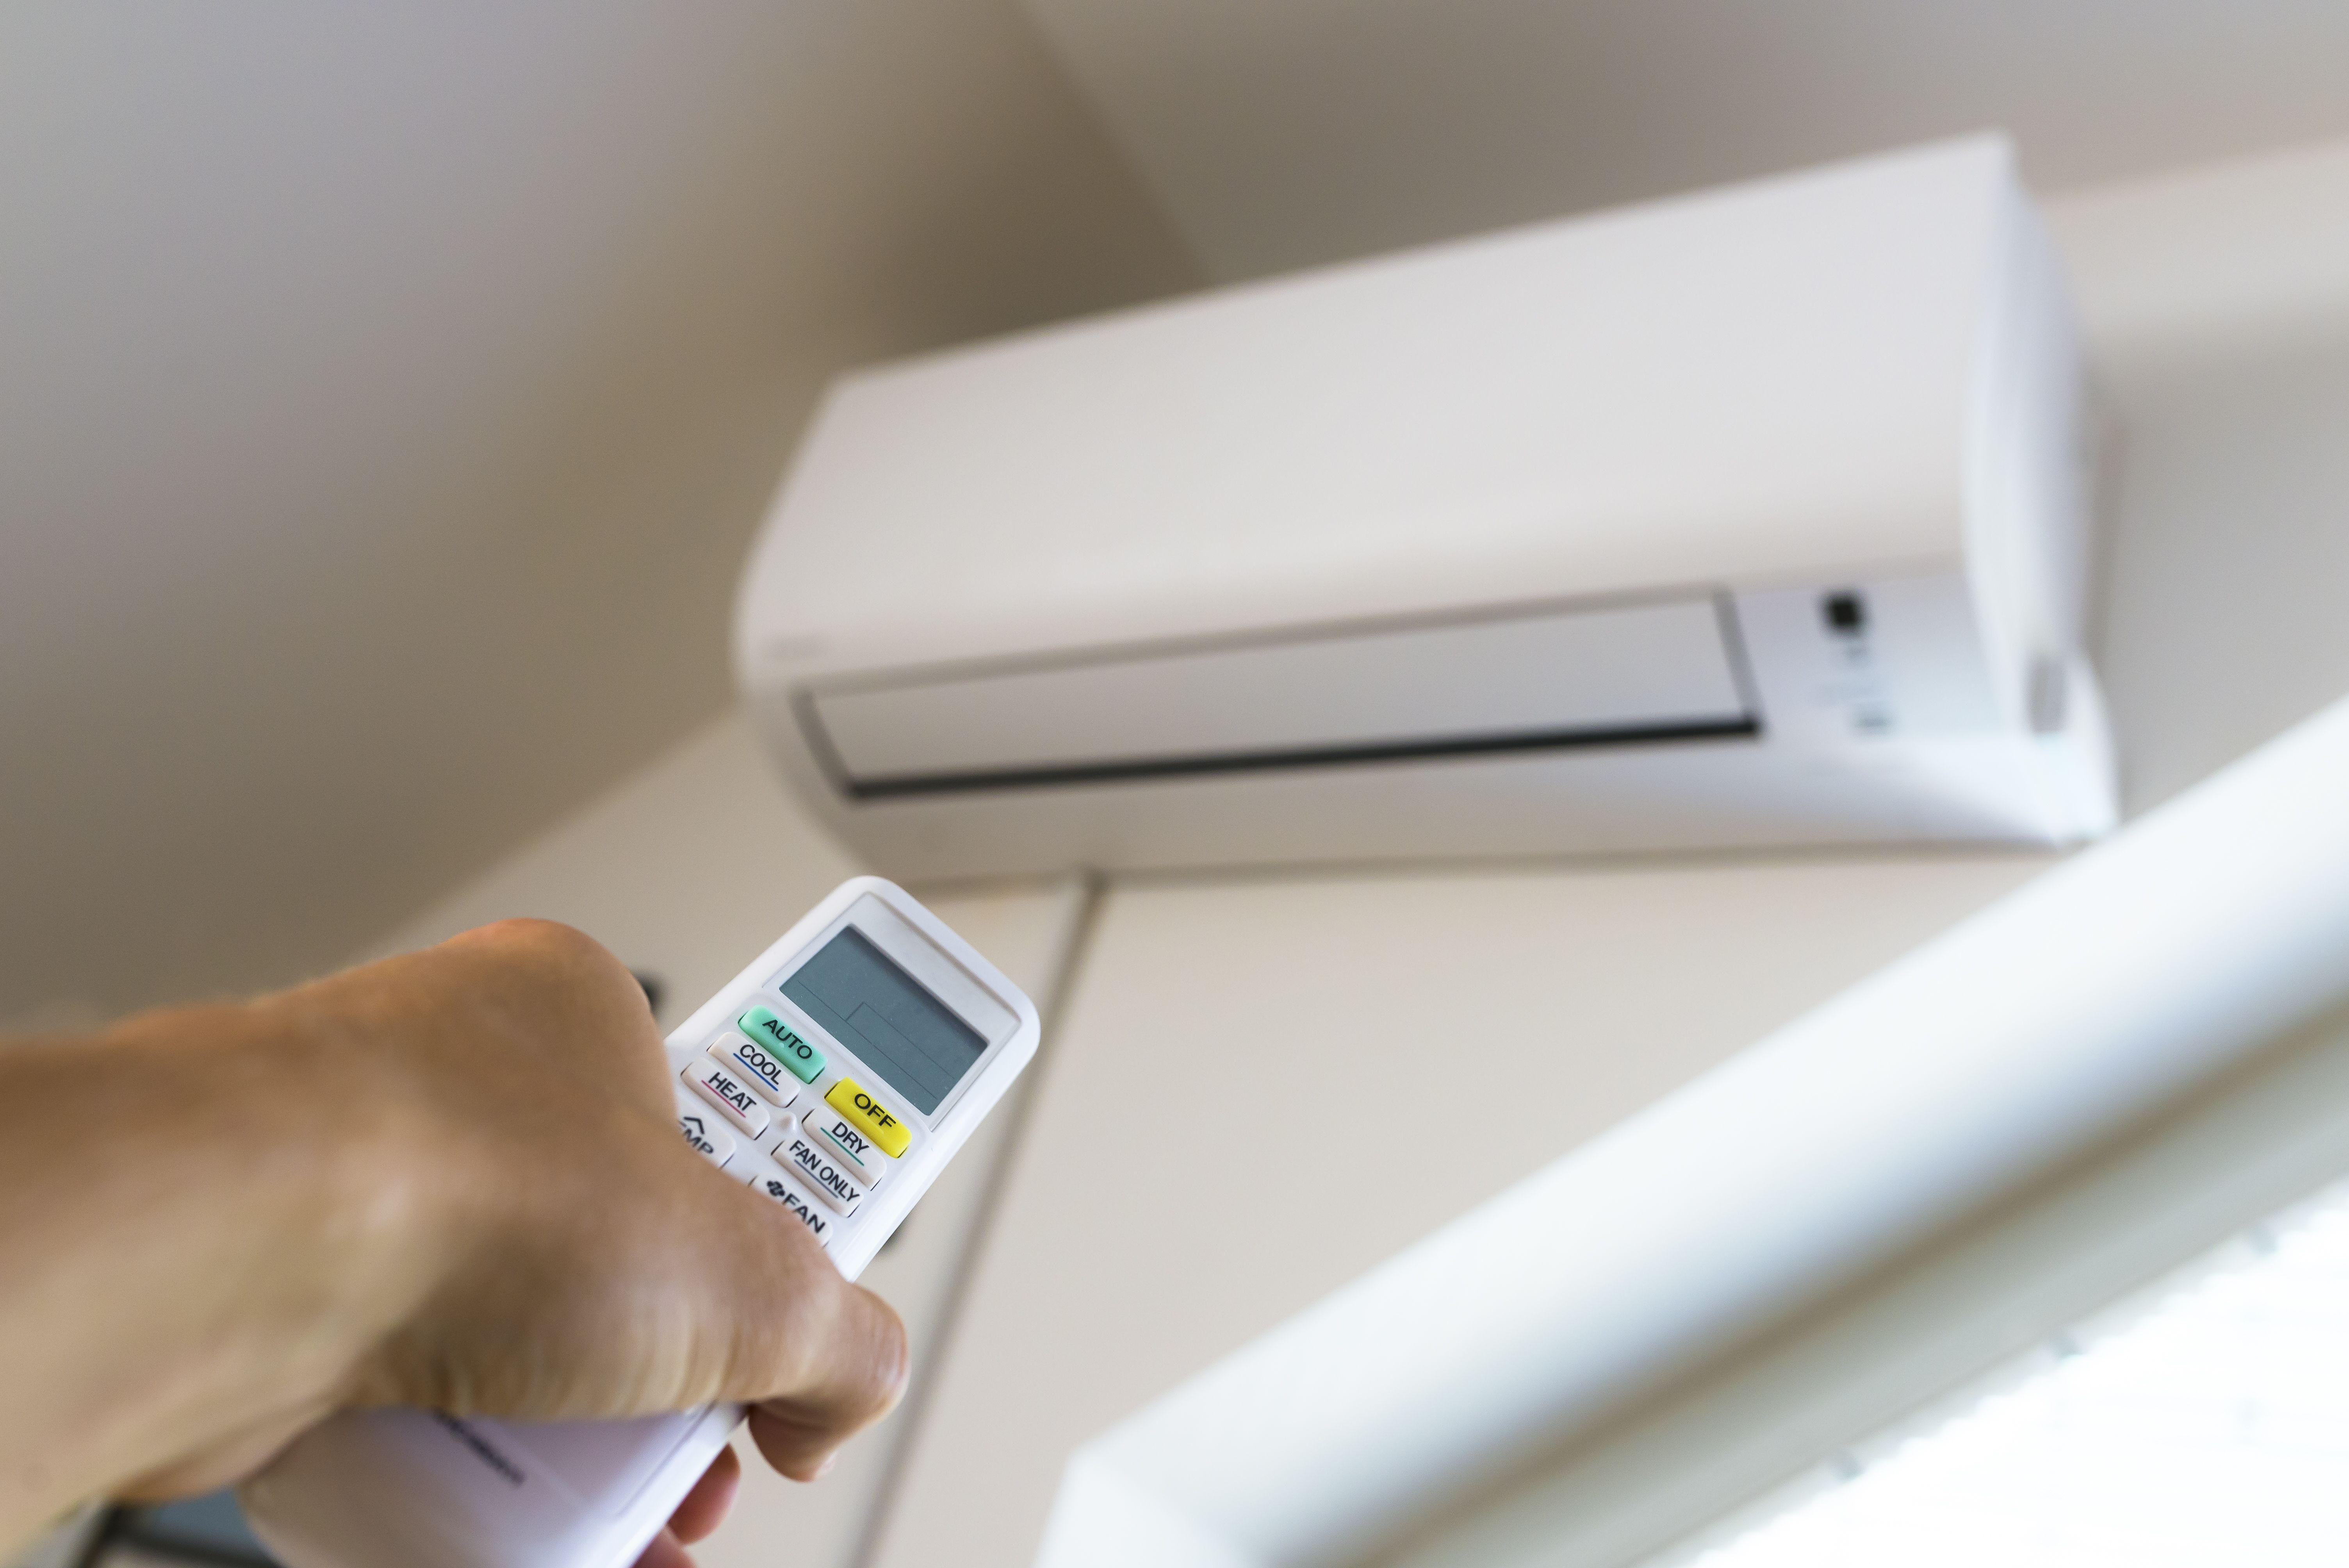 Instalación de aire acondicionado en Bizkaia (Vizcaya)- leioa, getxo,bilbao: Servicios de Iusturi